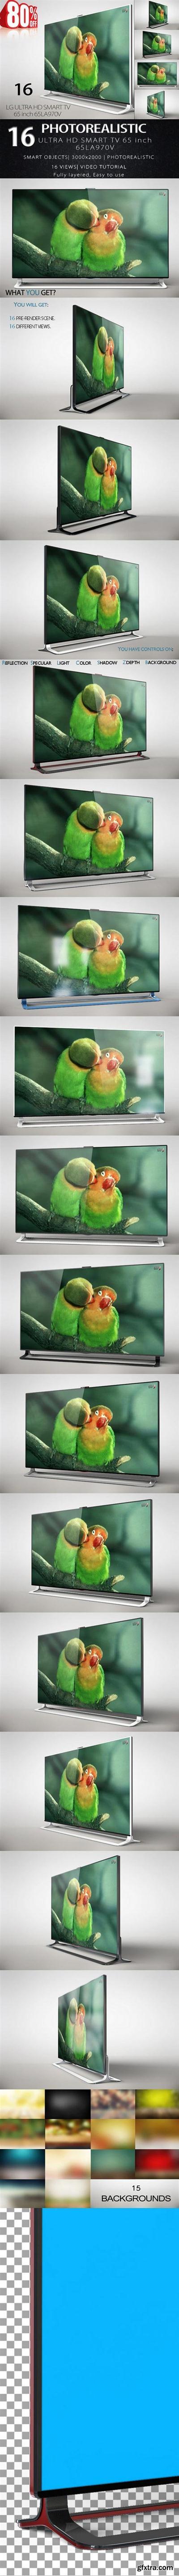 CM - Bundle LG Ultra HD Smart Tv 65 inch 572849